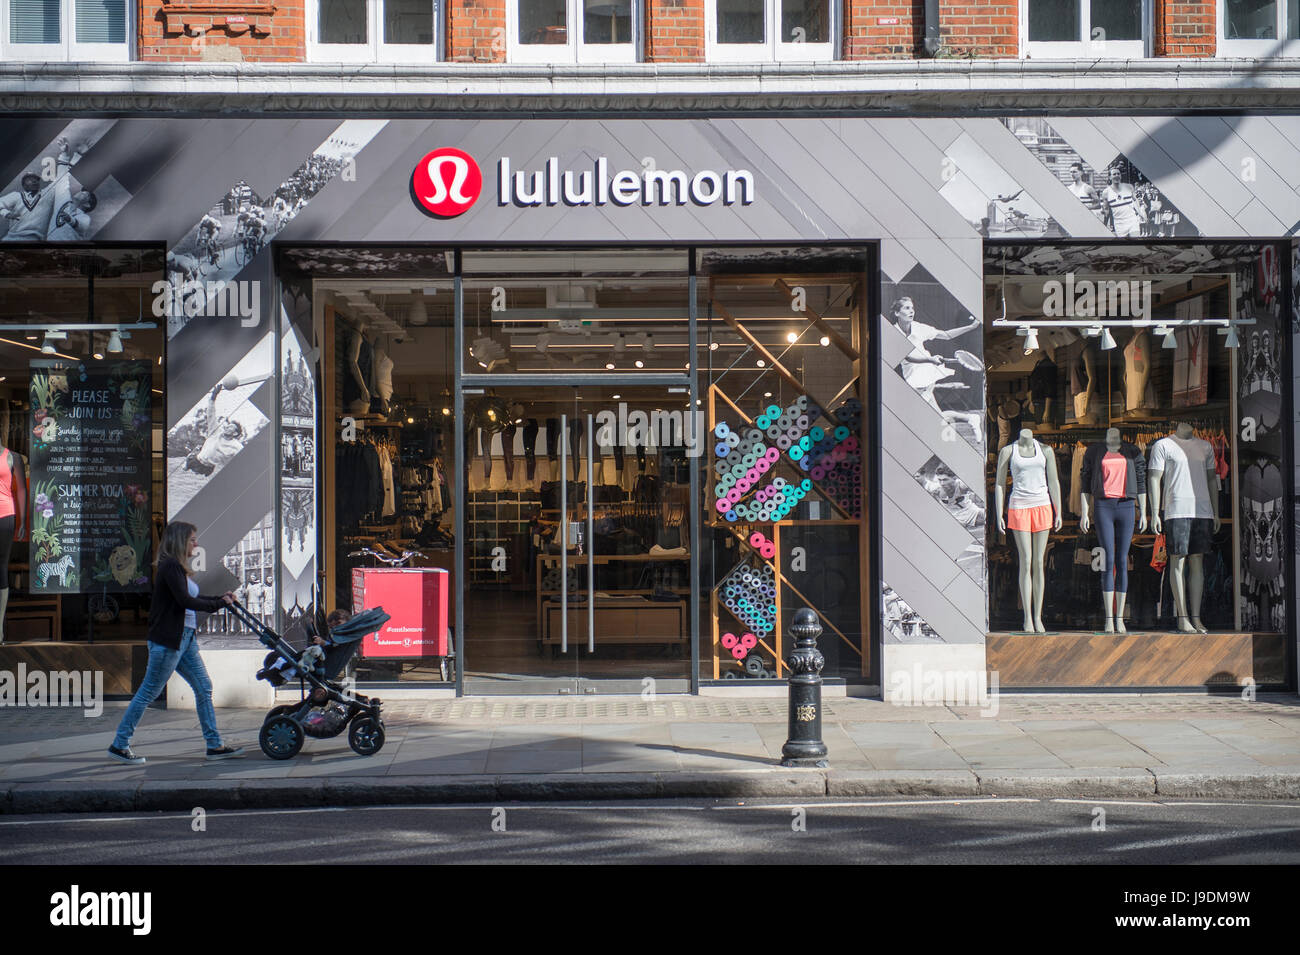 fbc3b2c4673 Lululemon athletic clothing store in Kings Road, Chelsea, London - Stock  Image